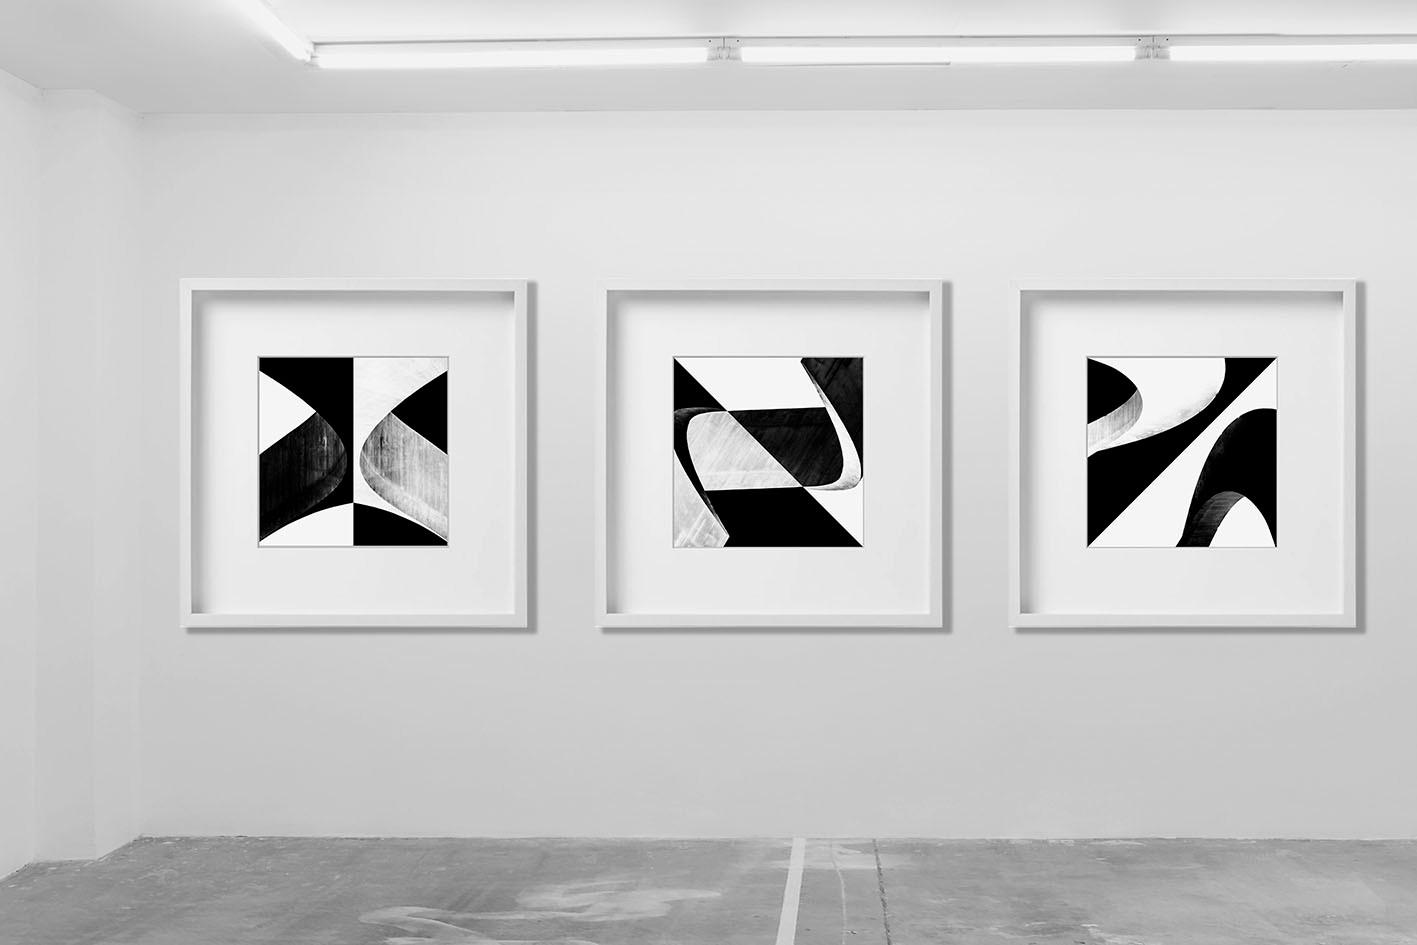 Hypnosis Studio Gallery